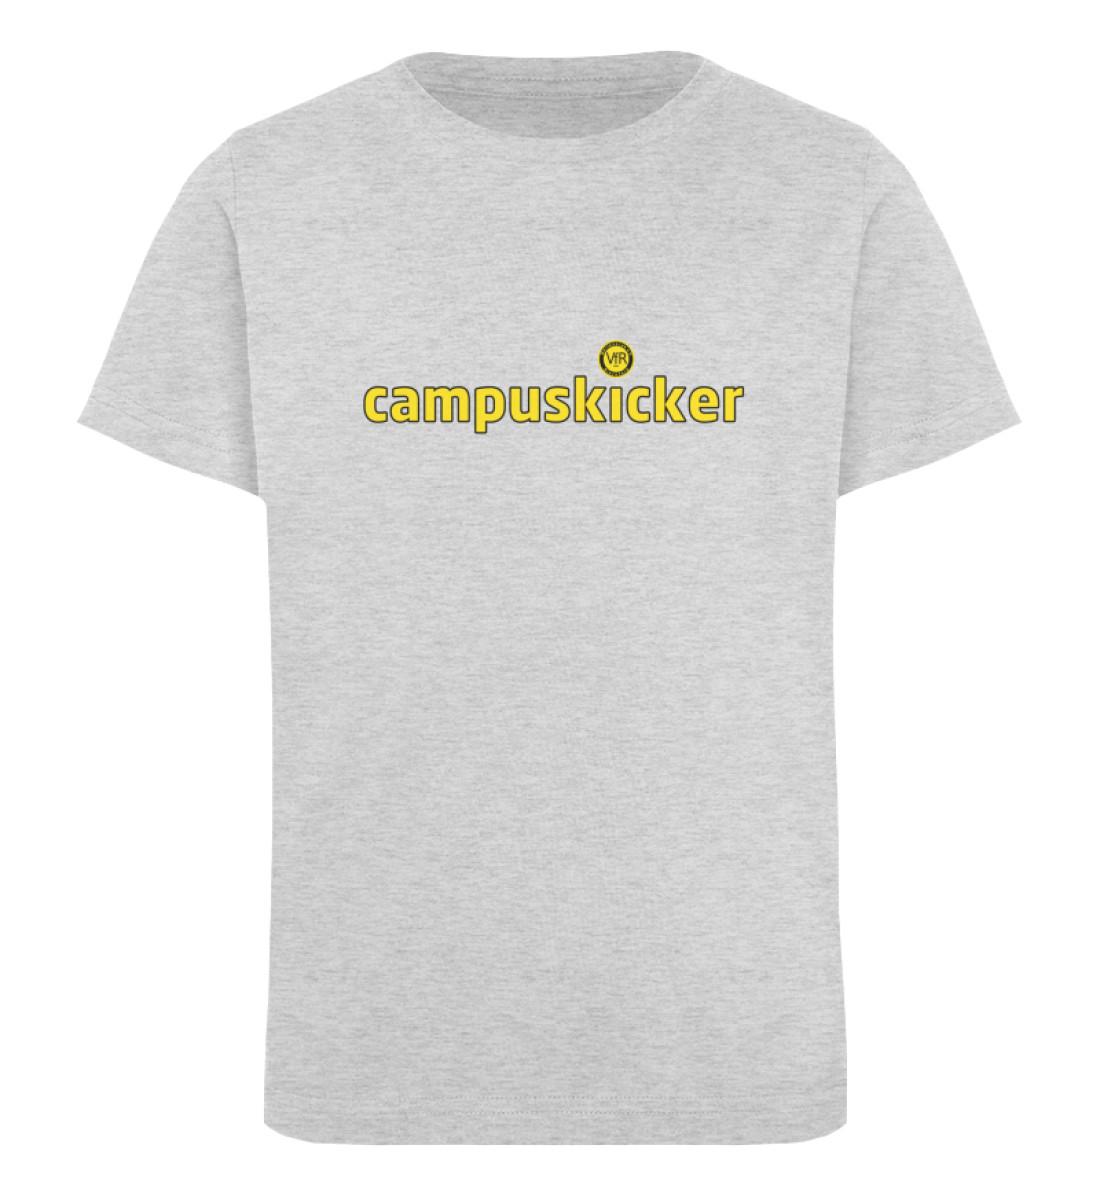 Campuskicker - Kinder Organic T-Shirt-6892